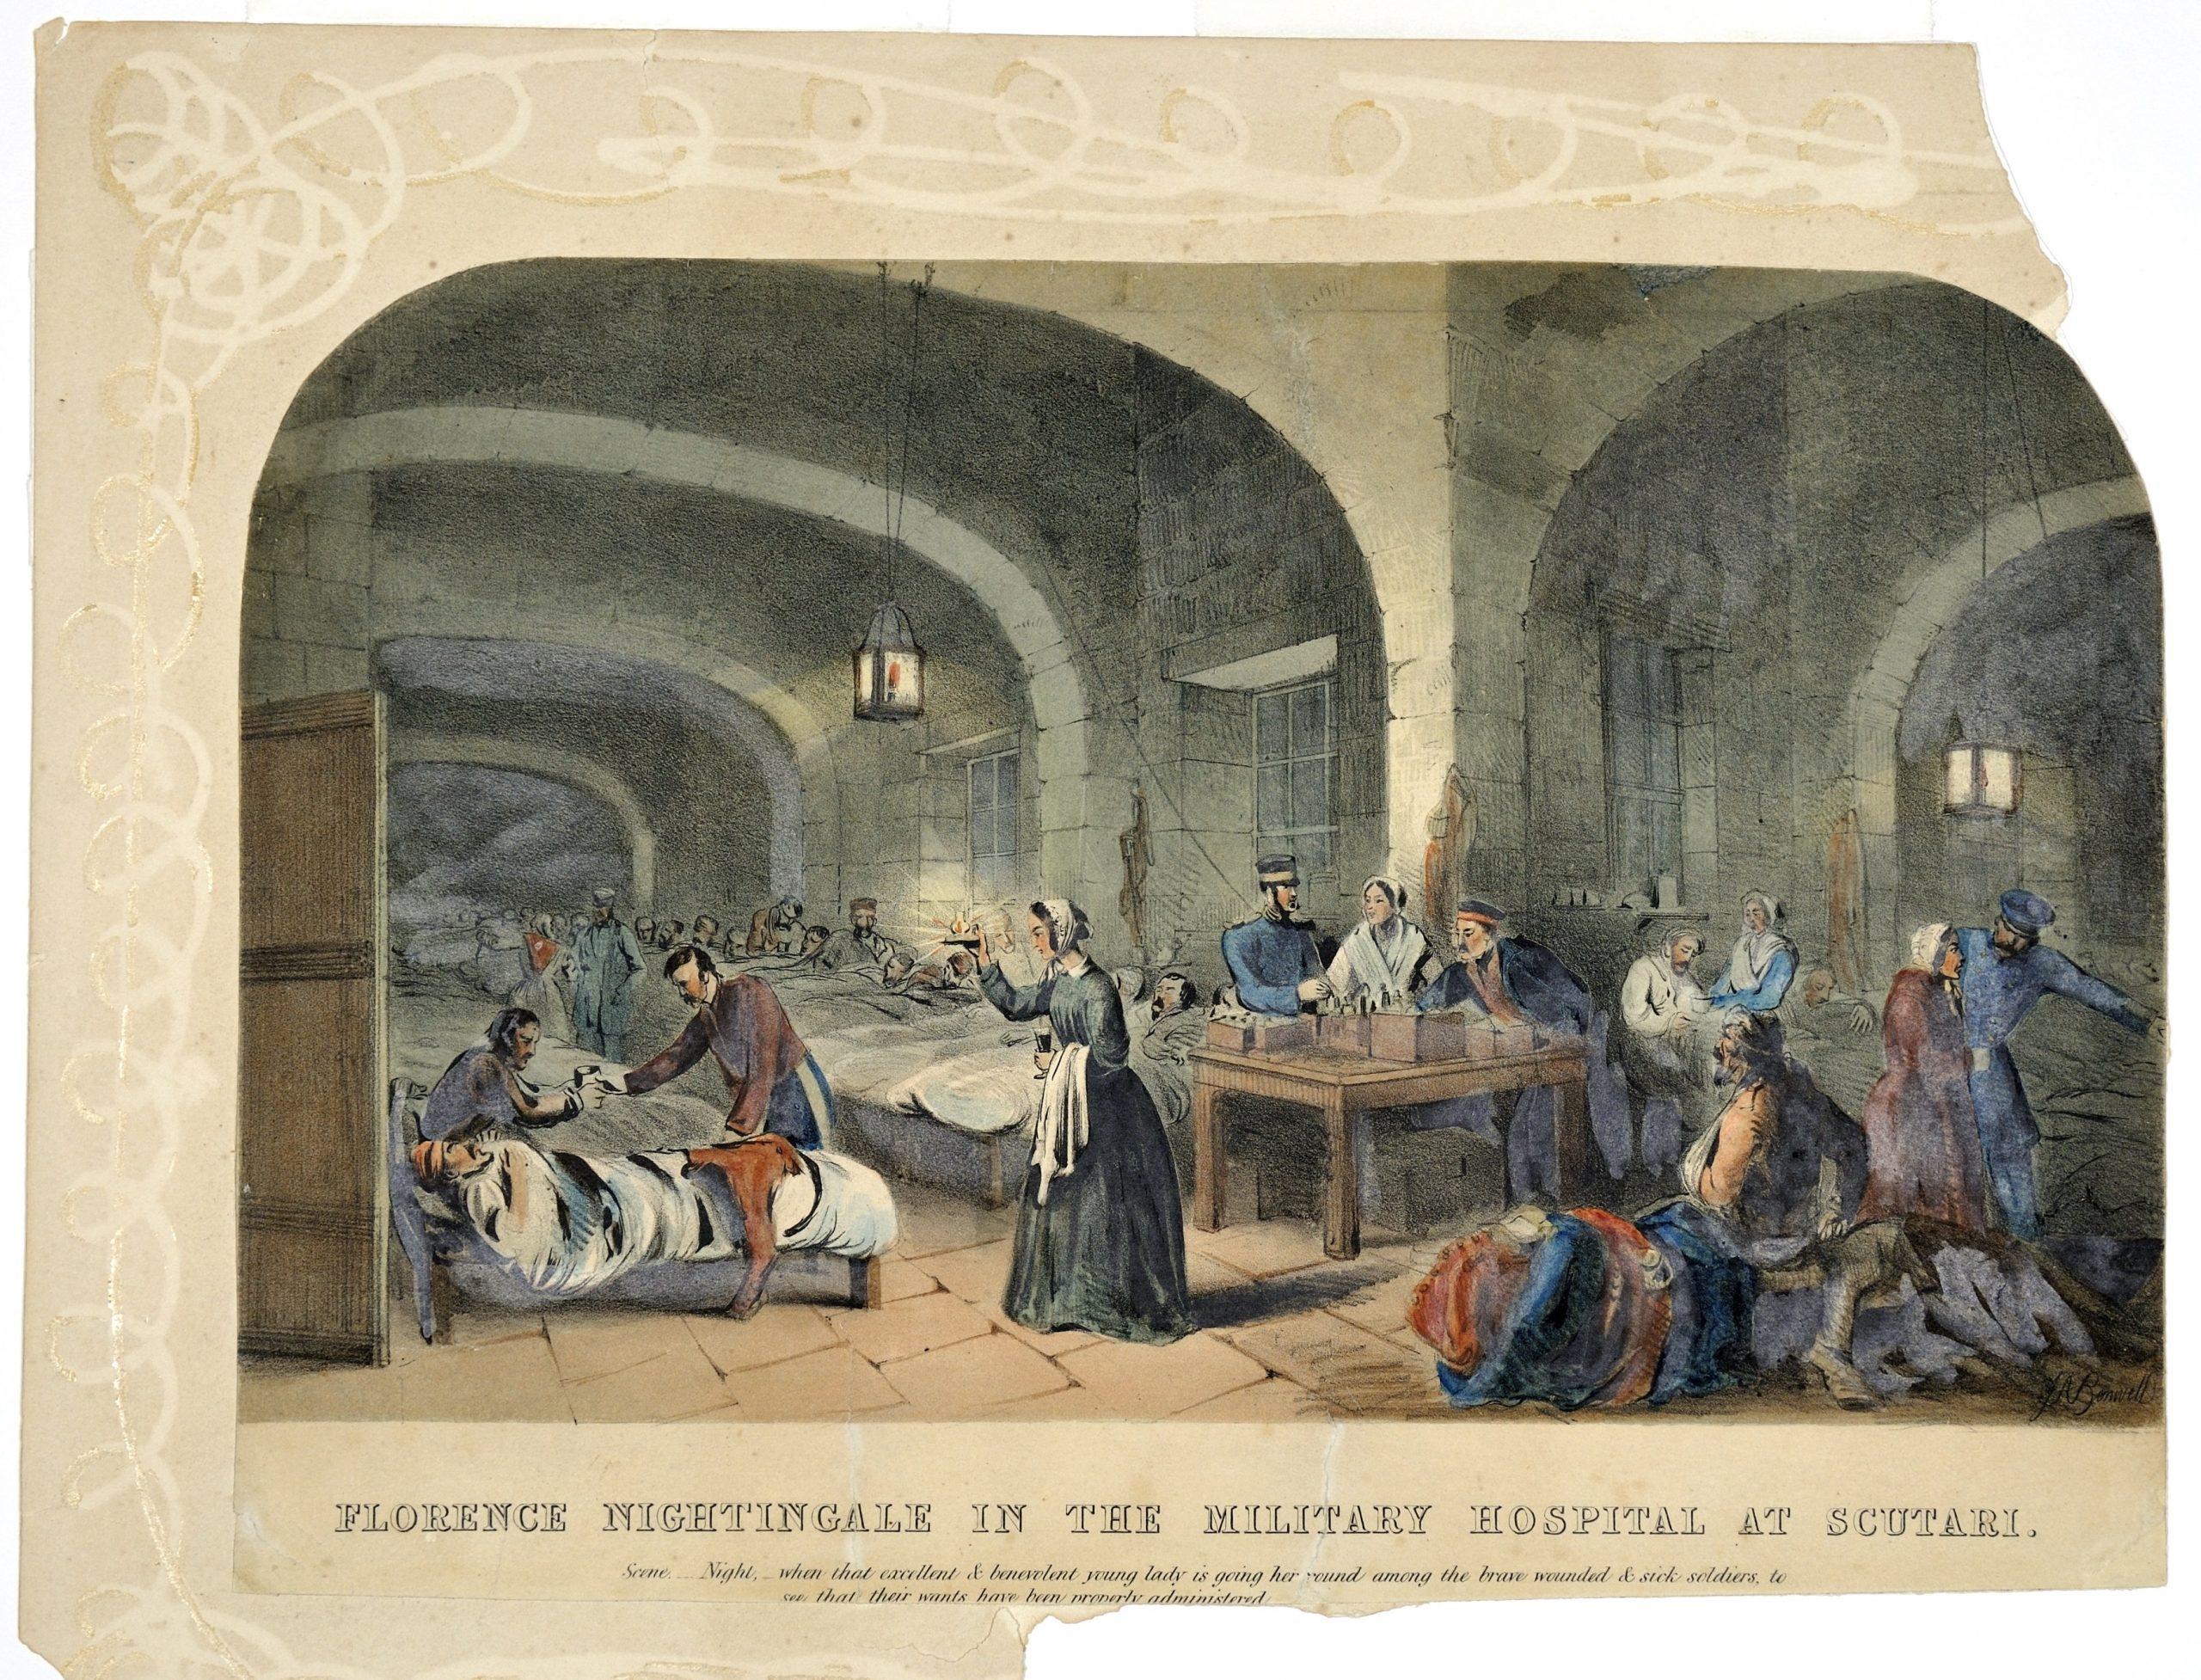 Florence Nightingale at Scutari Hospital